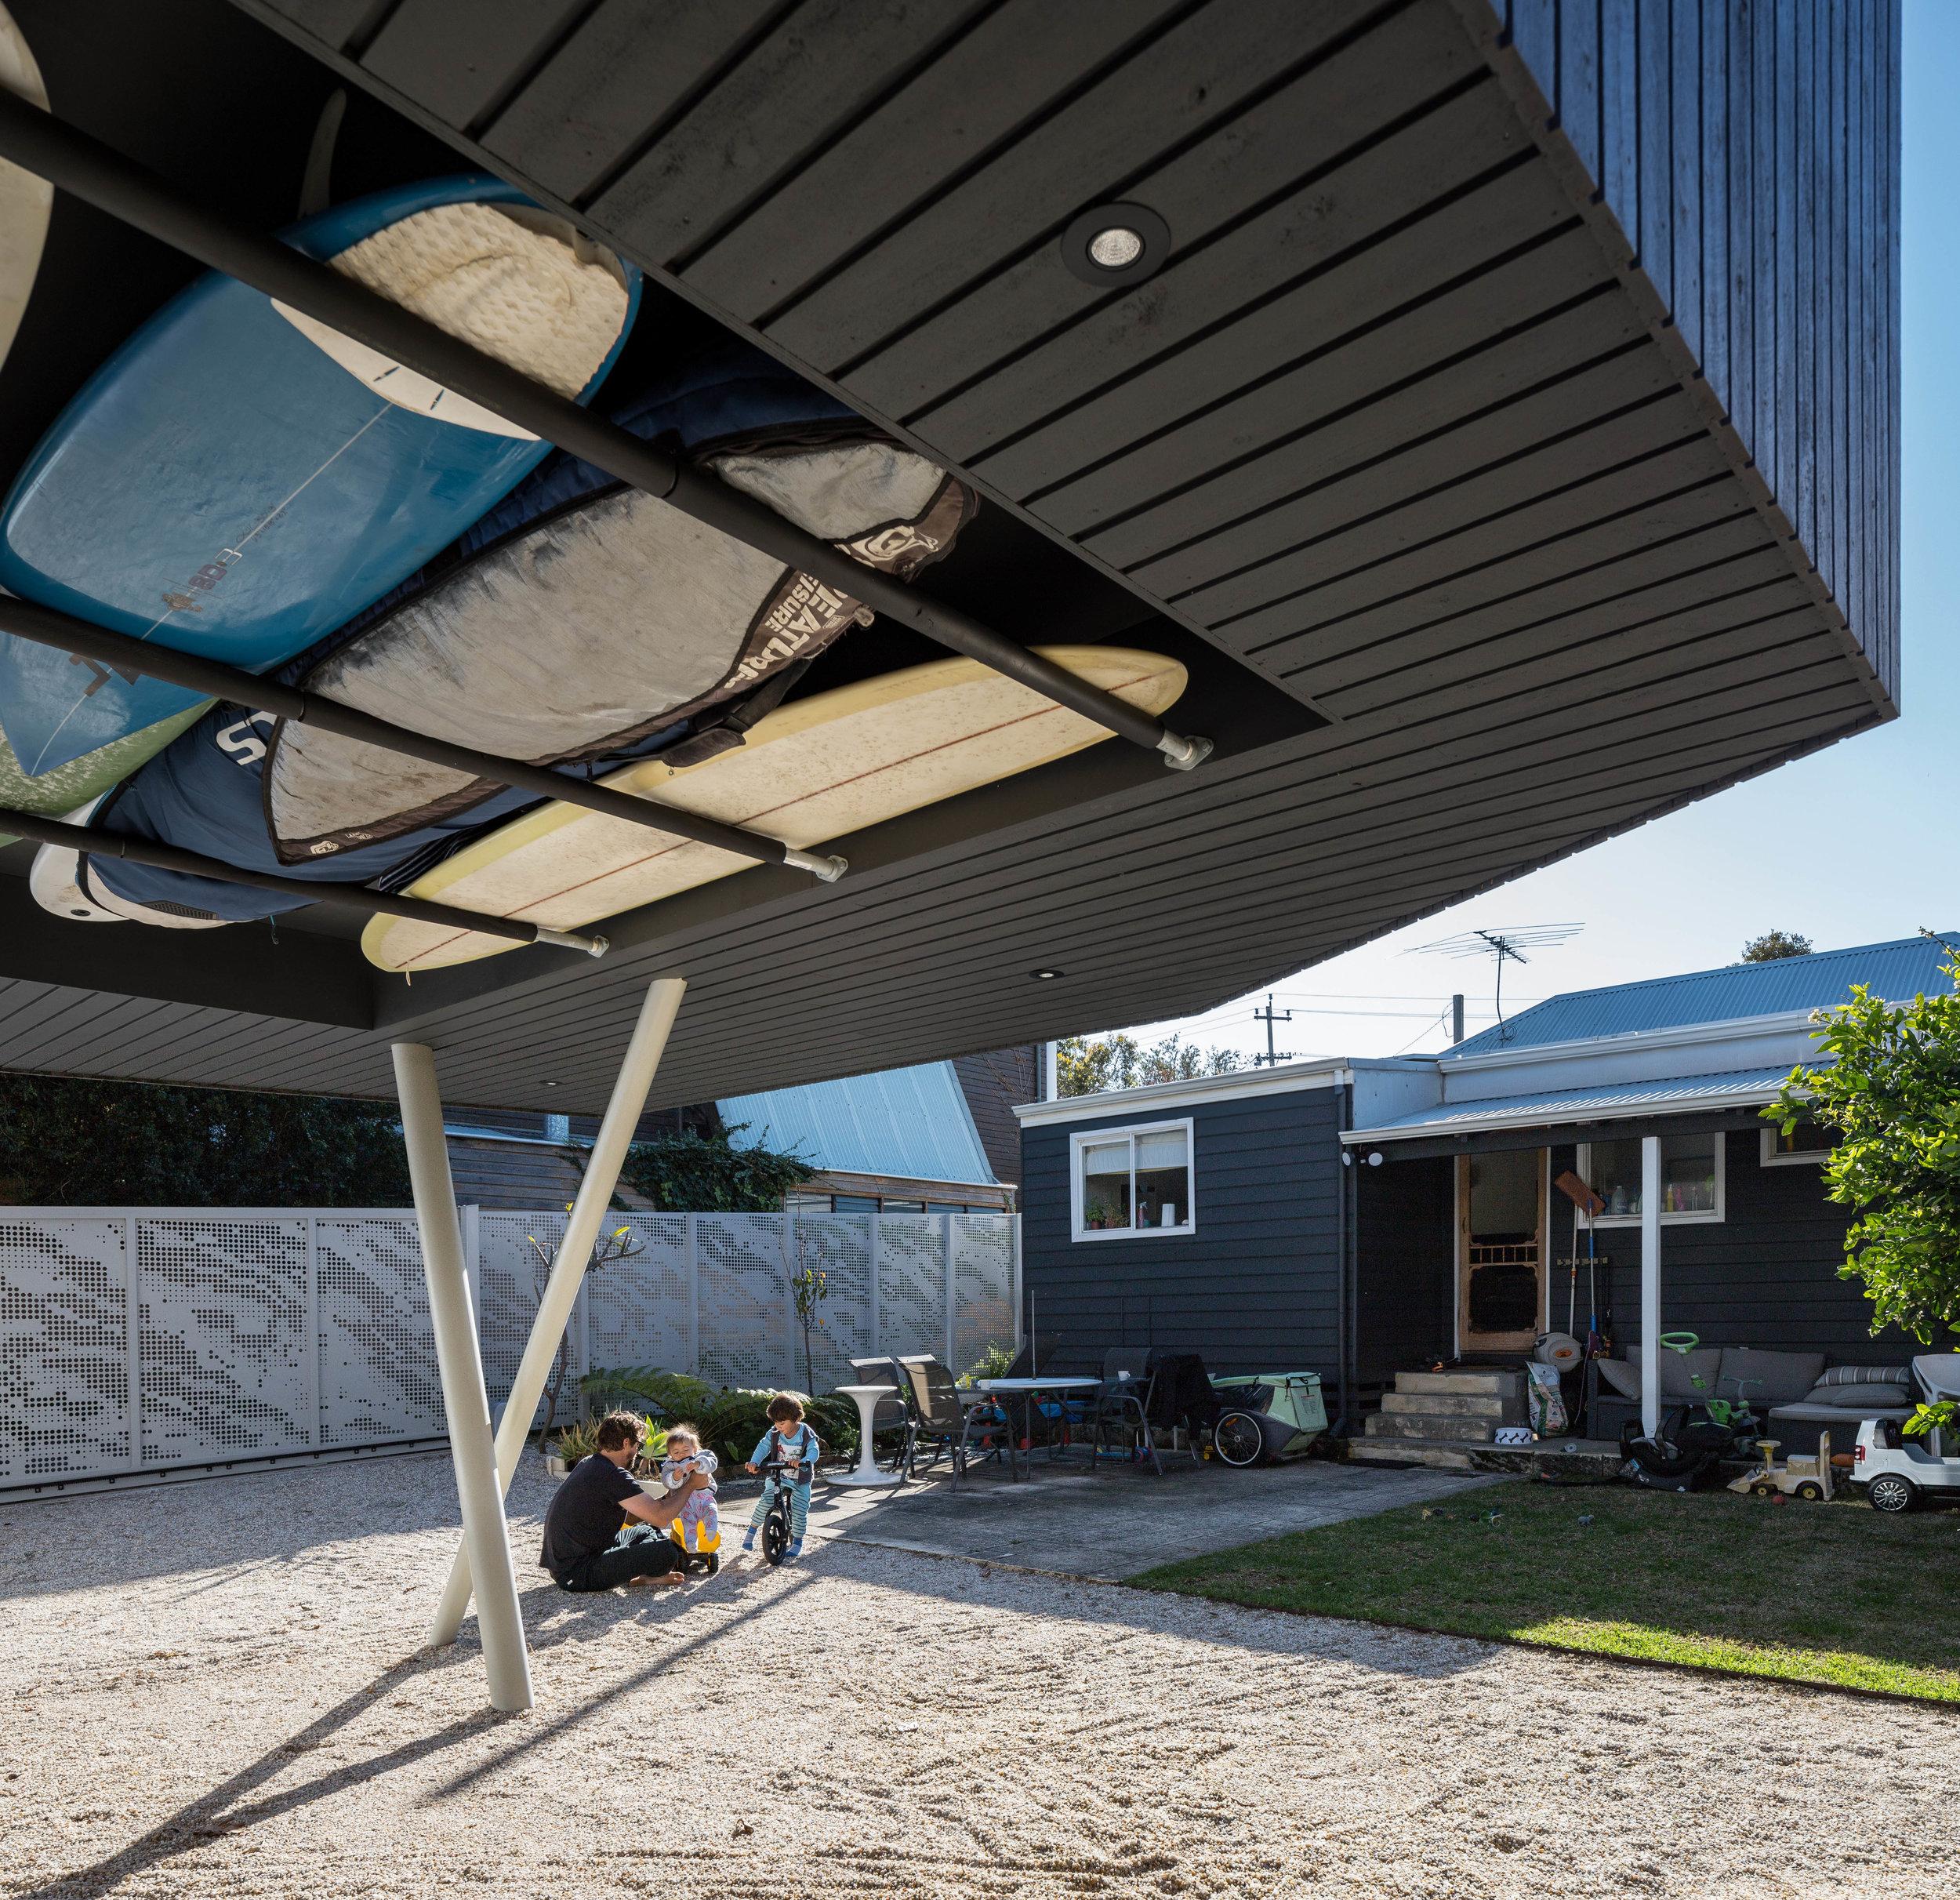 3476-small_Beach Office_Braham Architects_Nicholas Putrasia_04.jpg